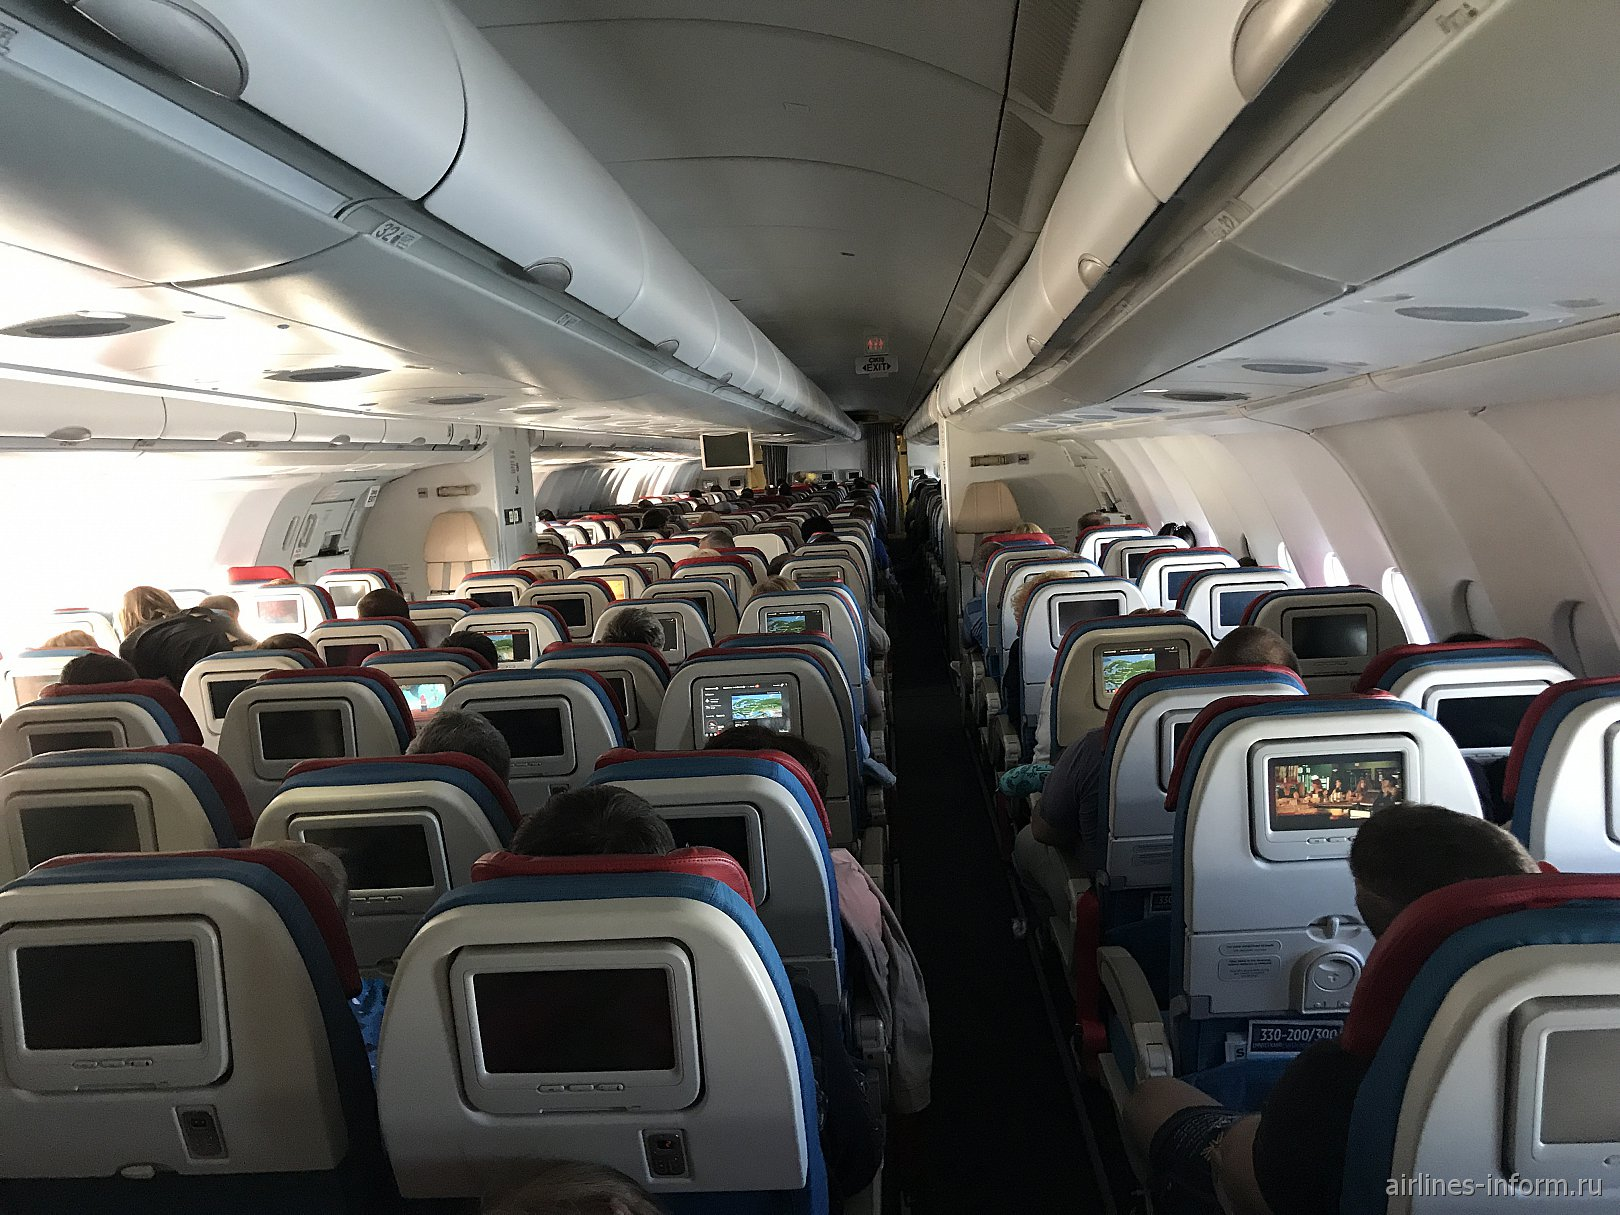 Салон эконом-класса в Airbus A330-200 Турецких авиалиний